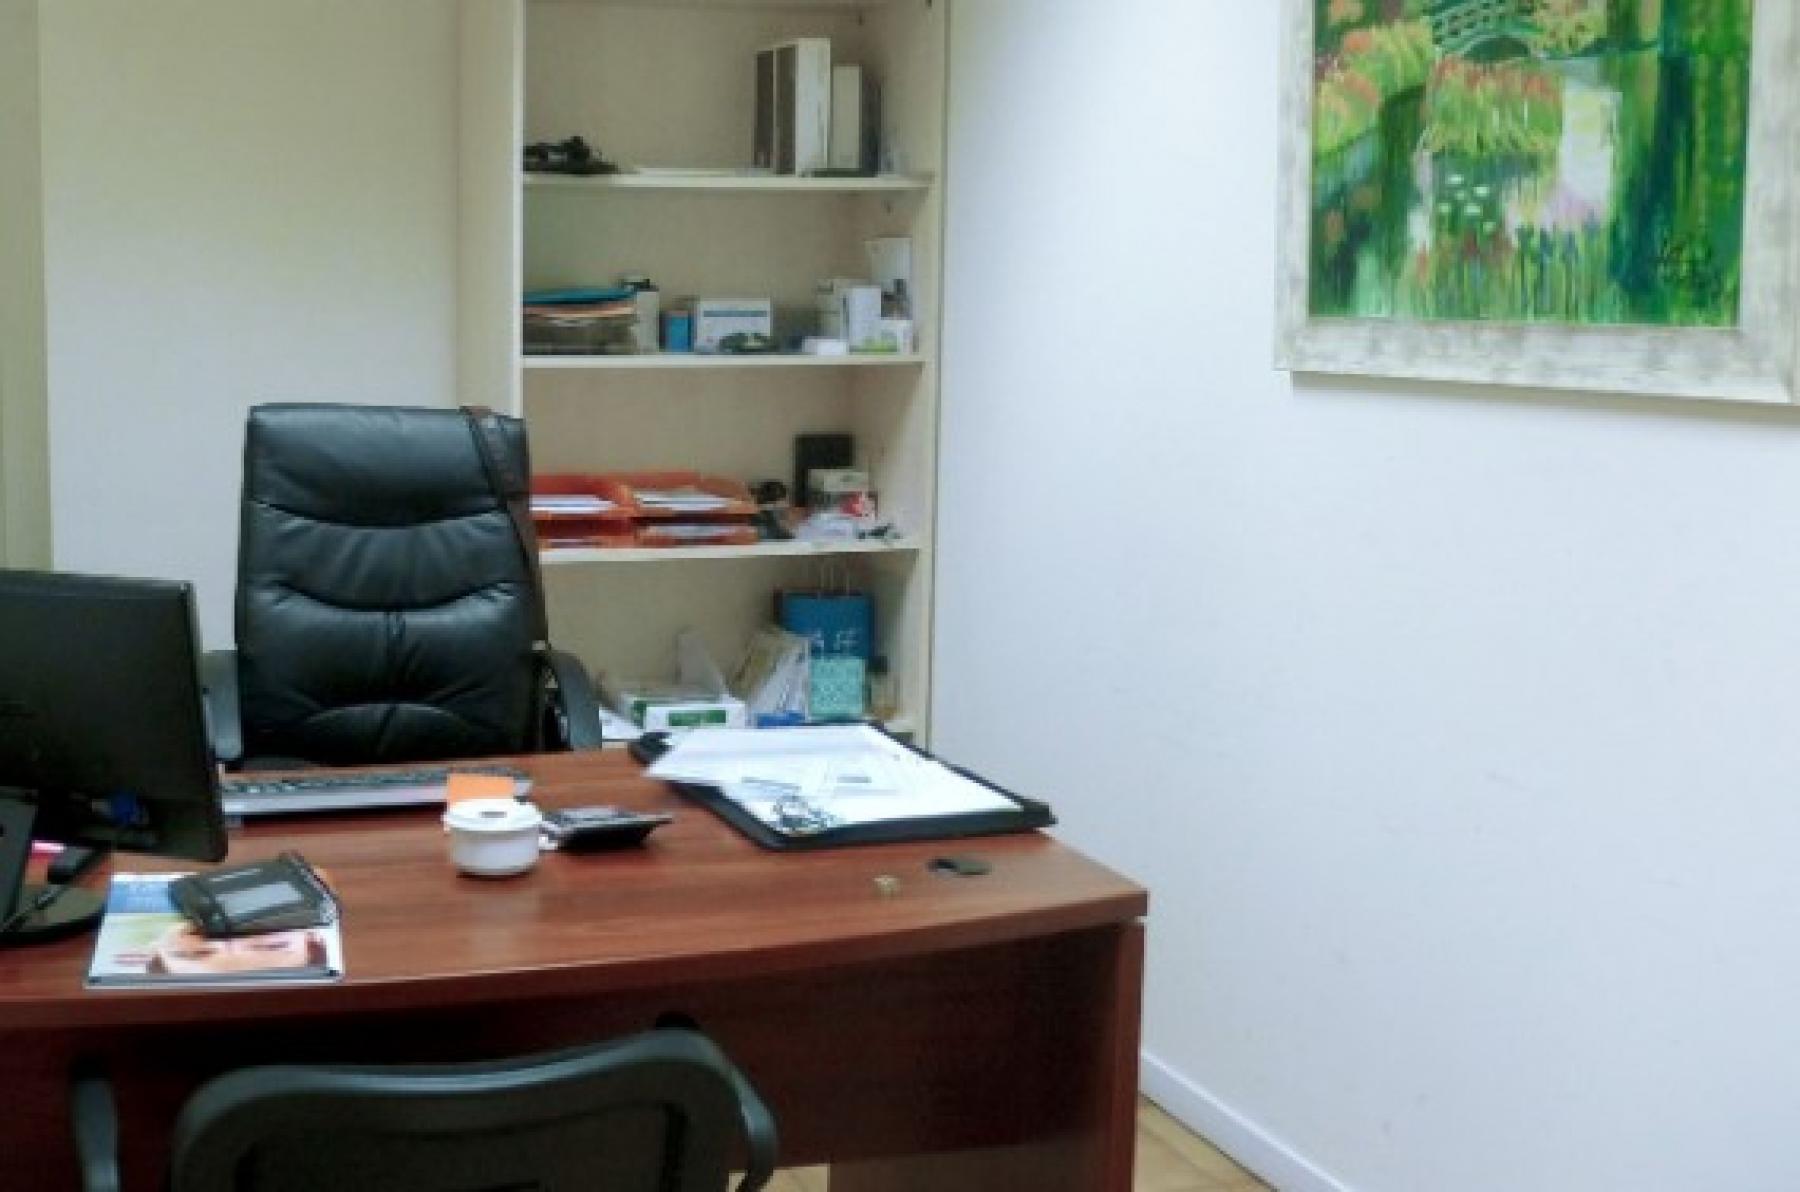 Alquilar oficinas Rambla del Brasil 28-30, Barcelona (4)